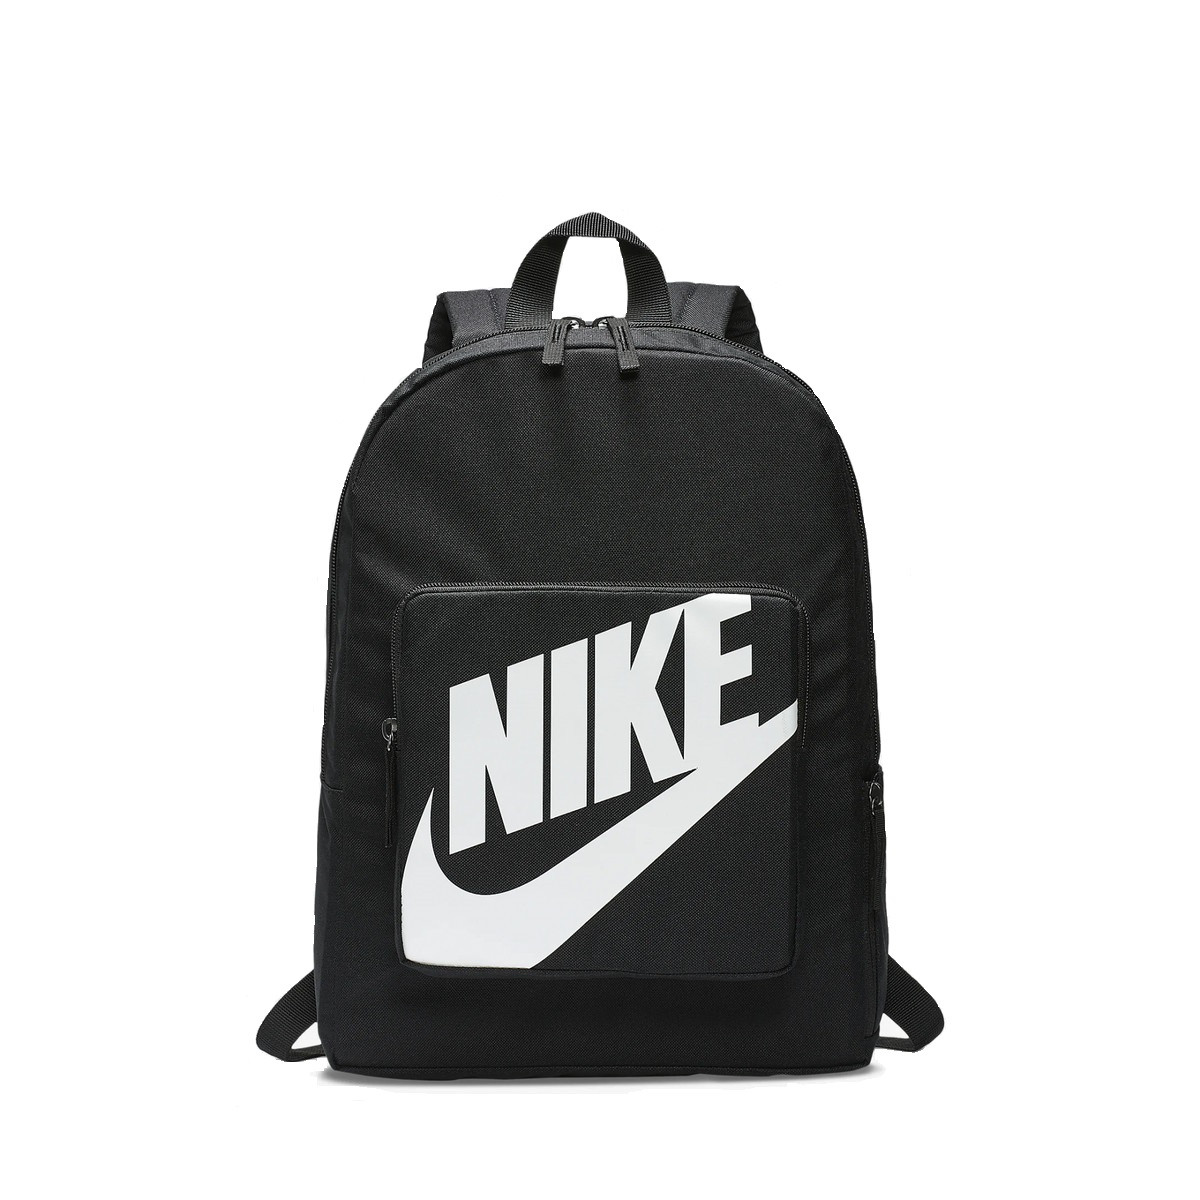 Mochila Unissex Nike Acessório Classic BKPK REF: BA5928-010